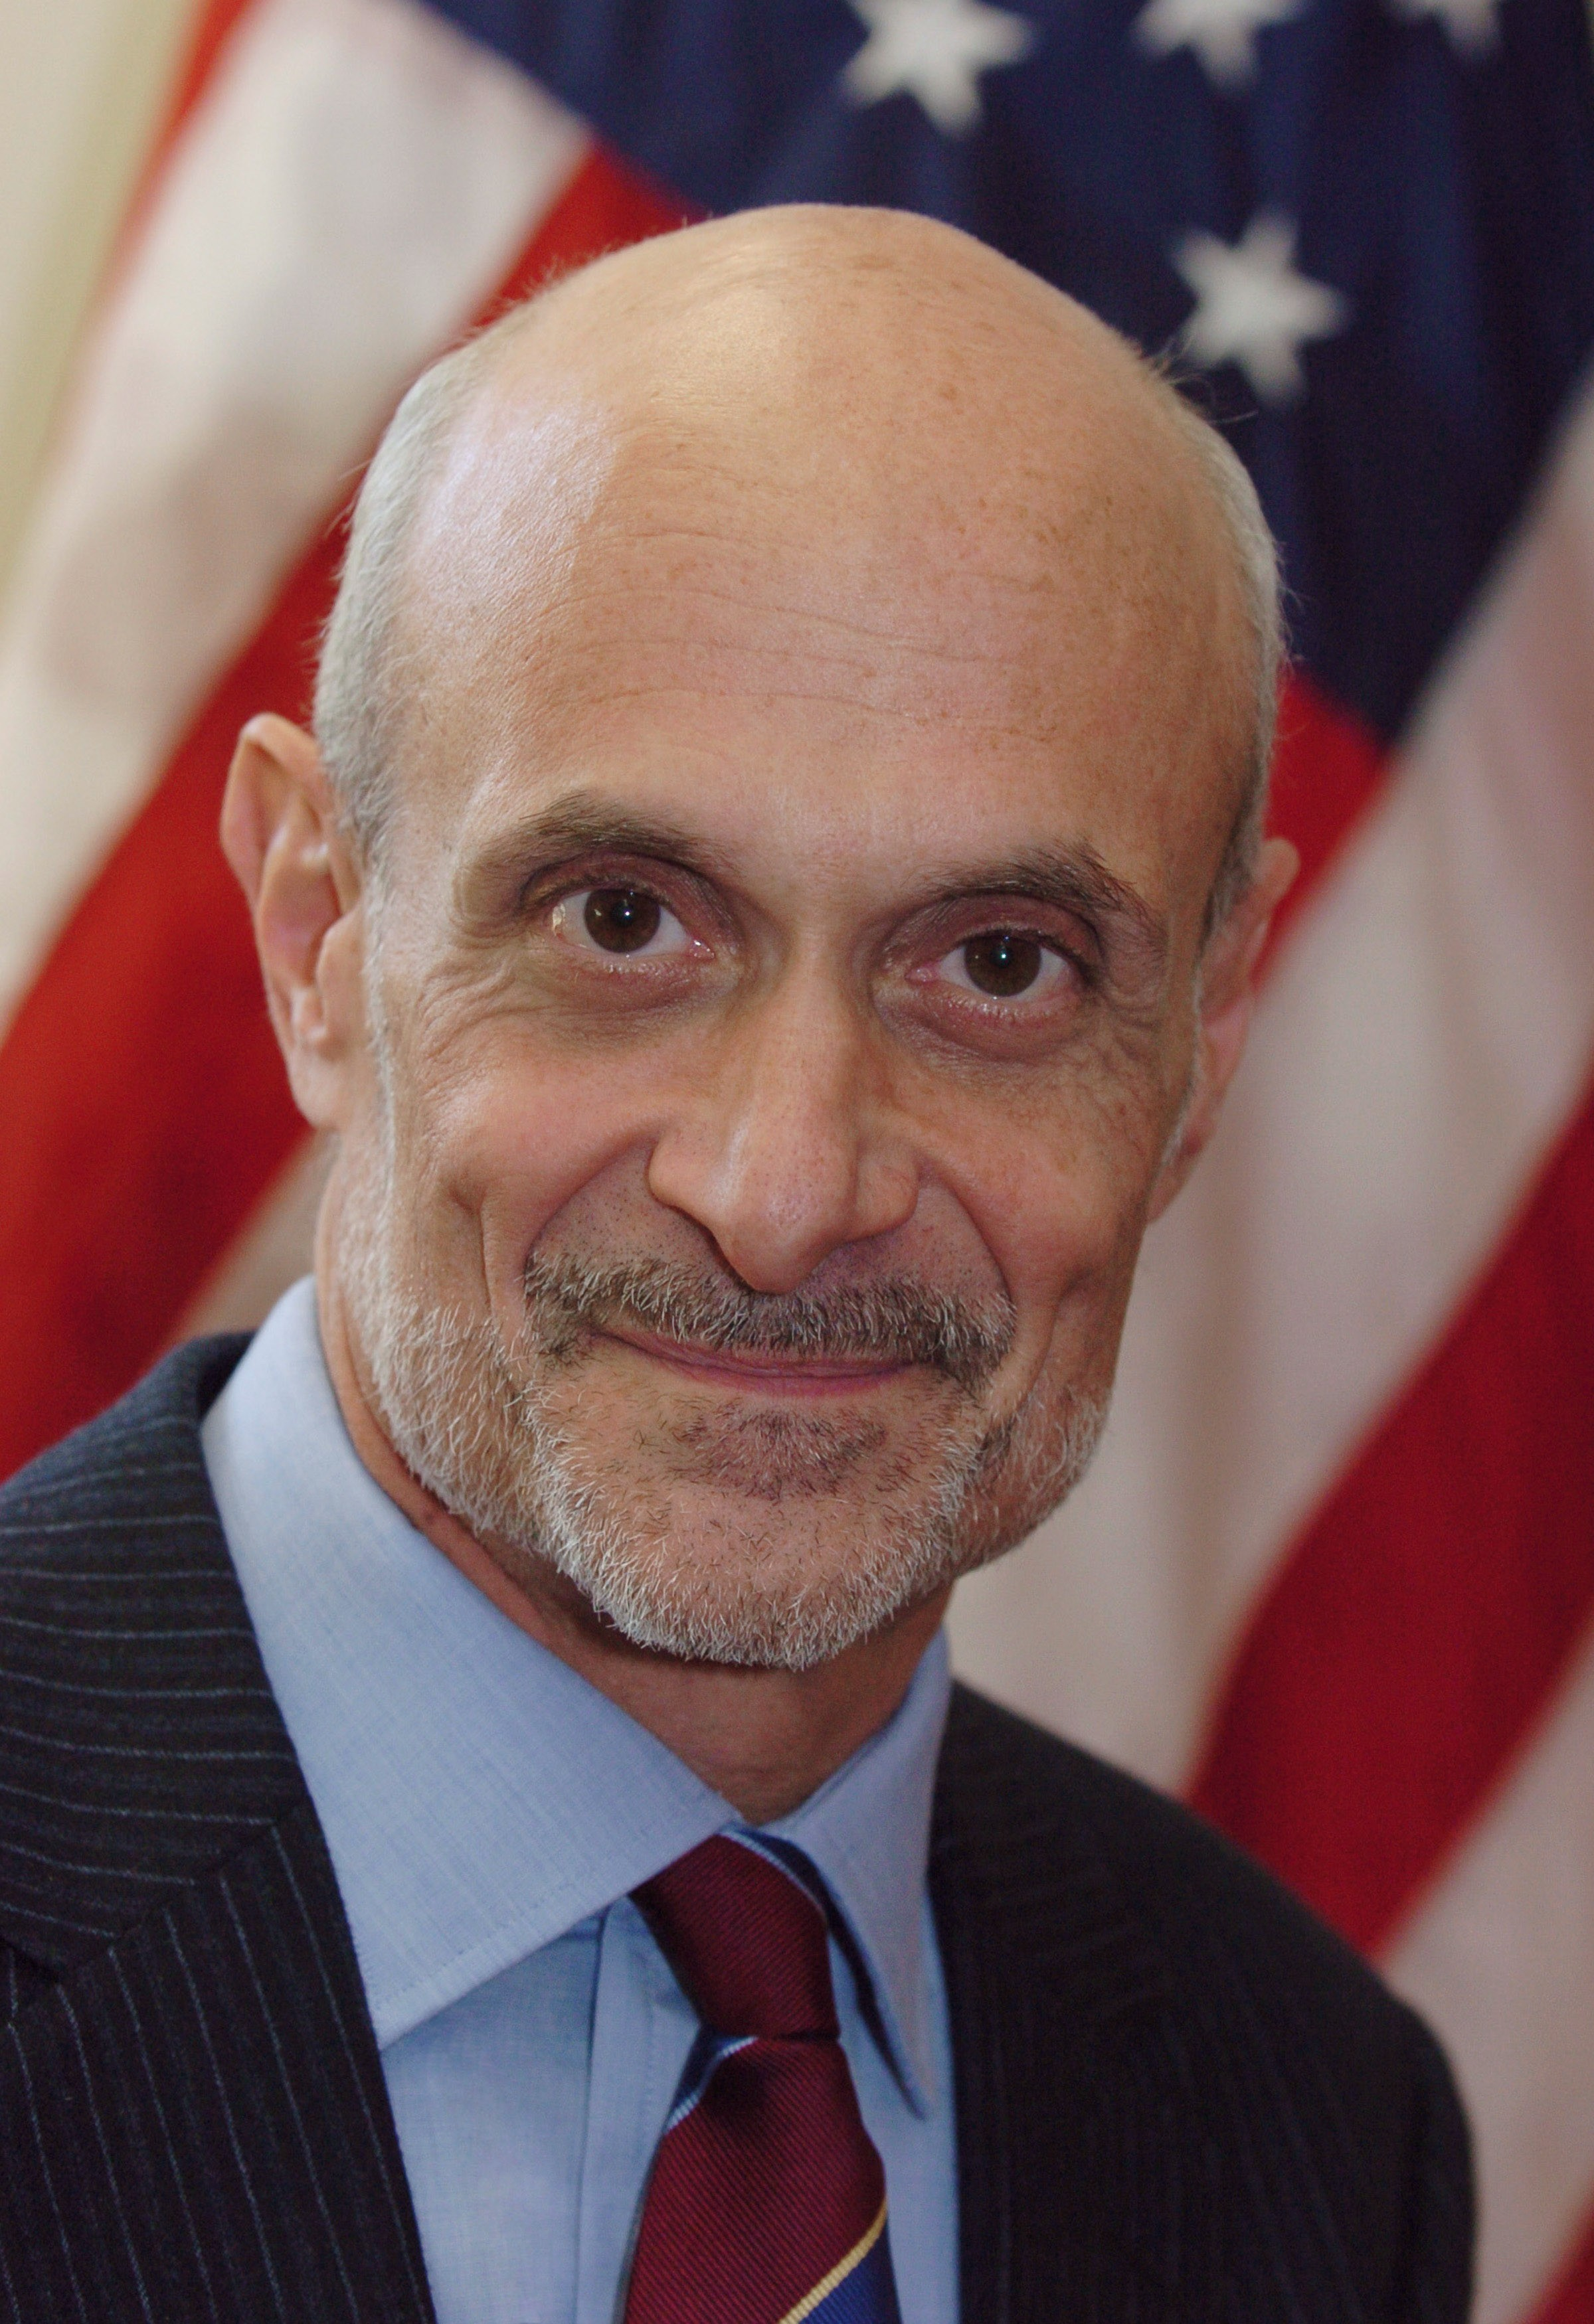 https://i0.wp.com/upload.wikimedia.org/wikipedia/commons/5/5d/Michael_Chertoff,_official_DHS_photo_portrait,_2005.jpg